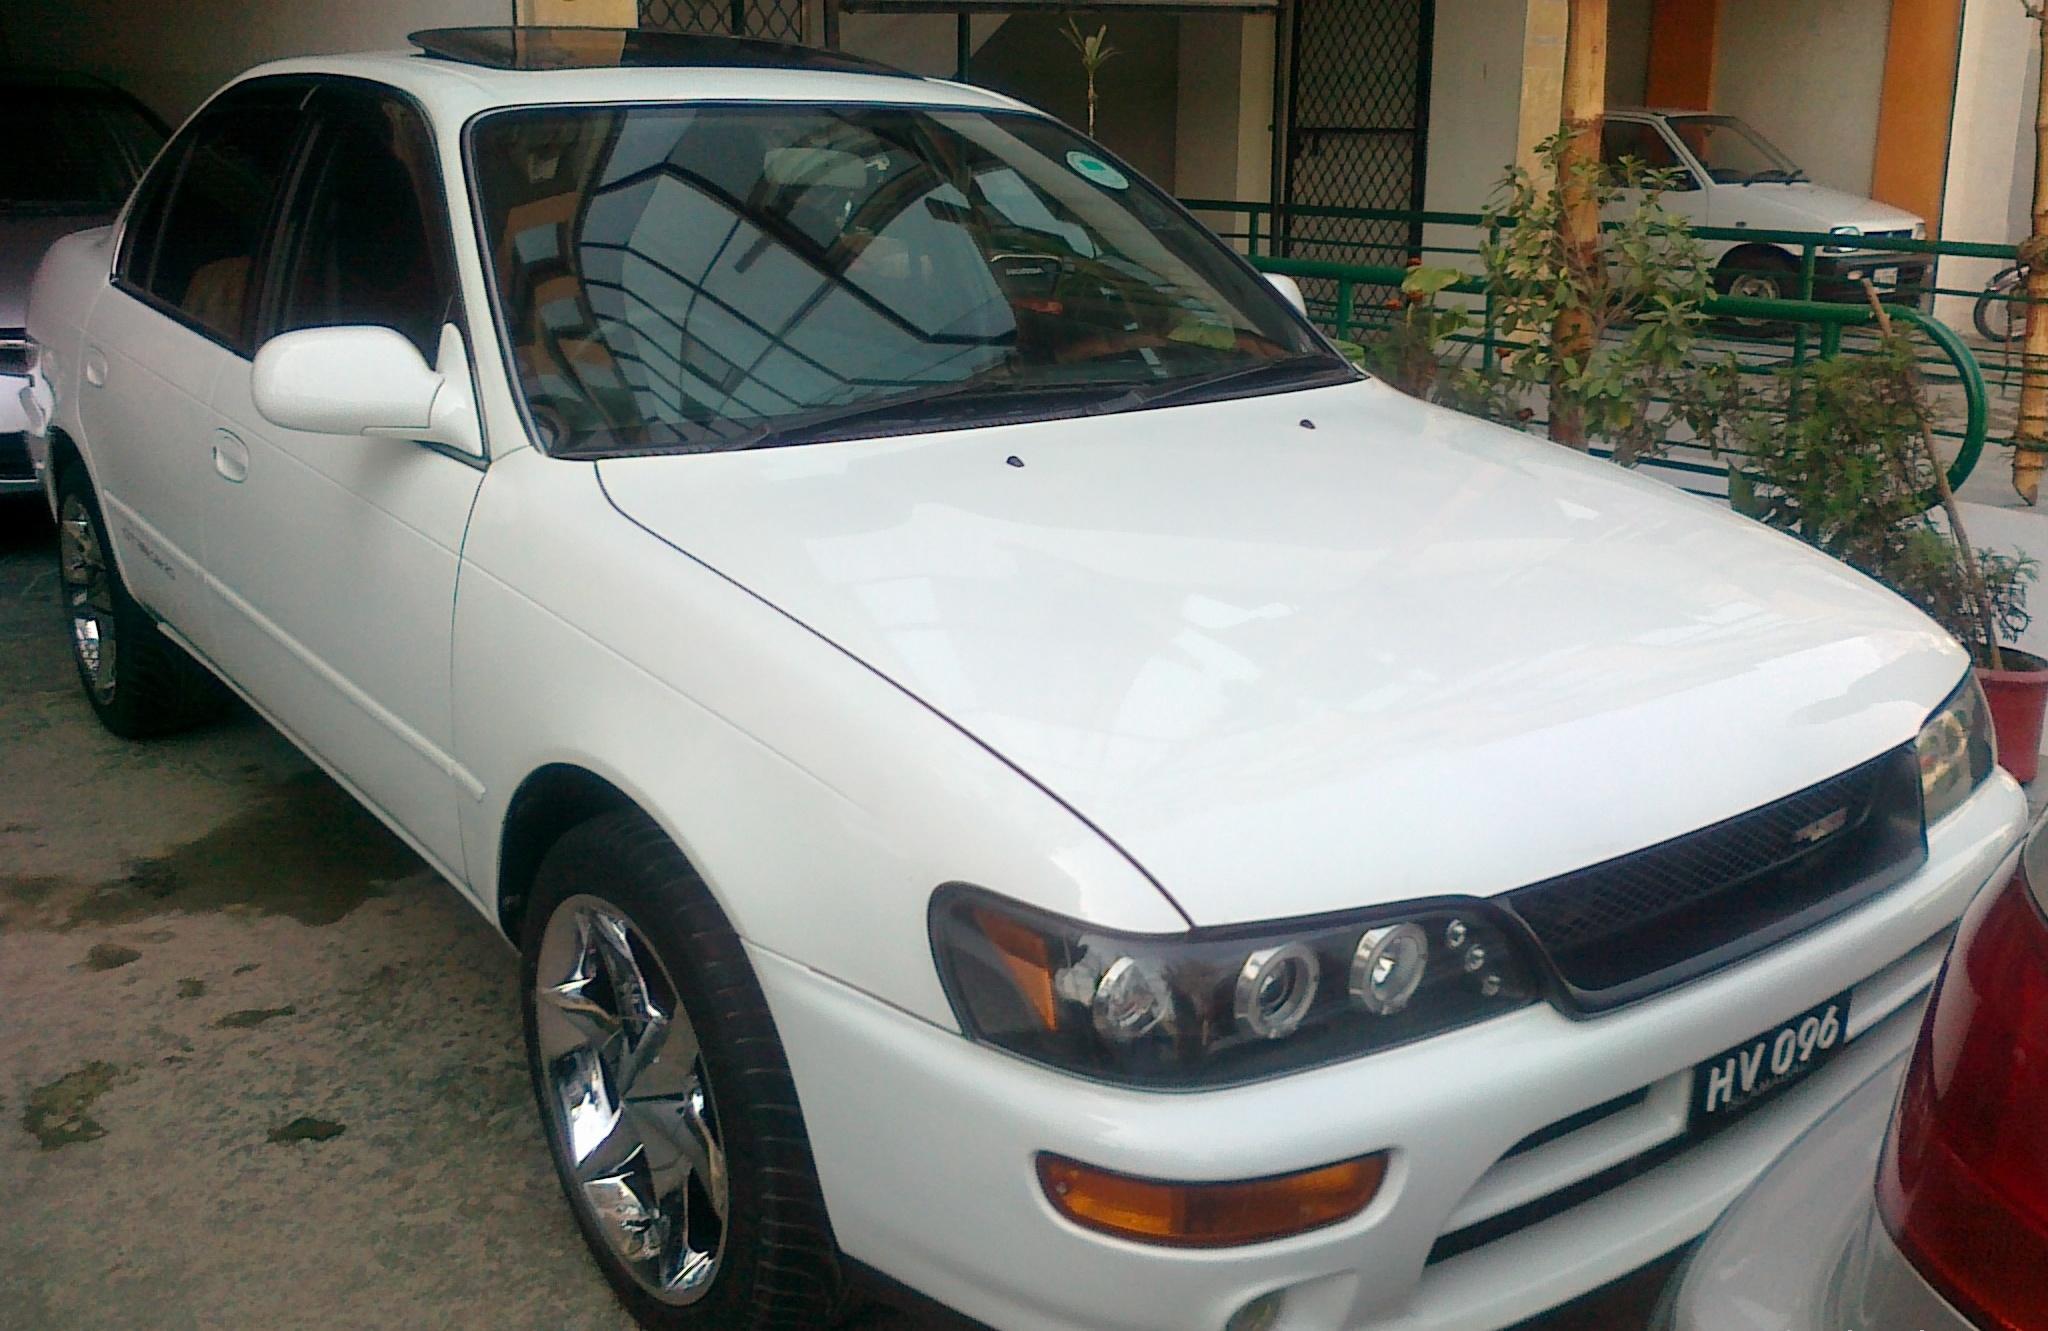 Toyota Corolla - 1993 Original GT Twin cam Image-1